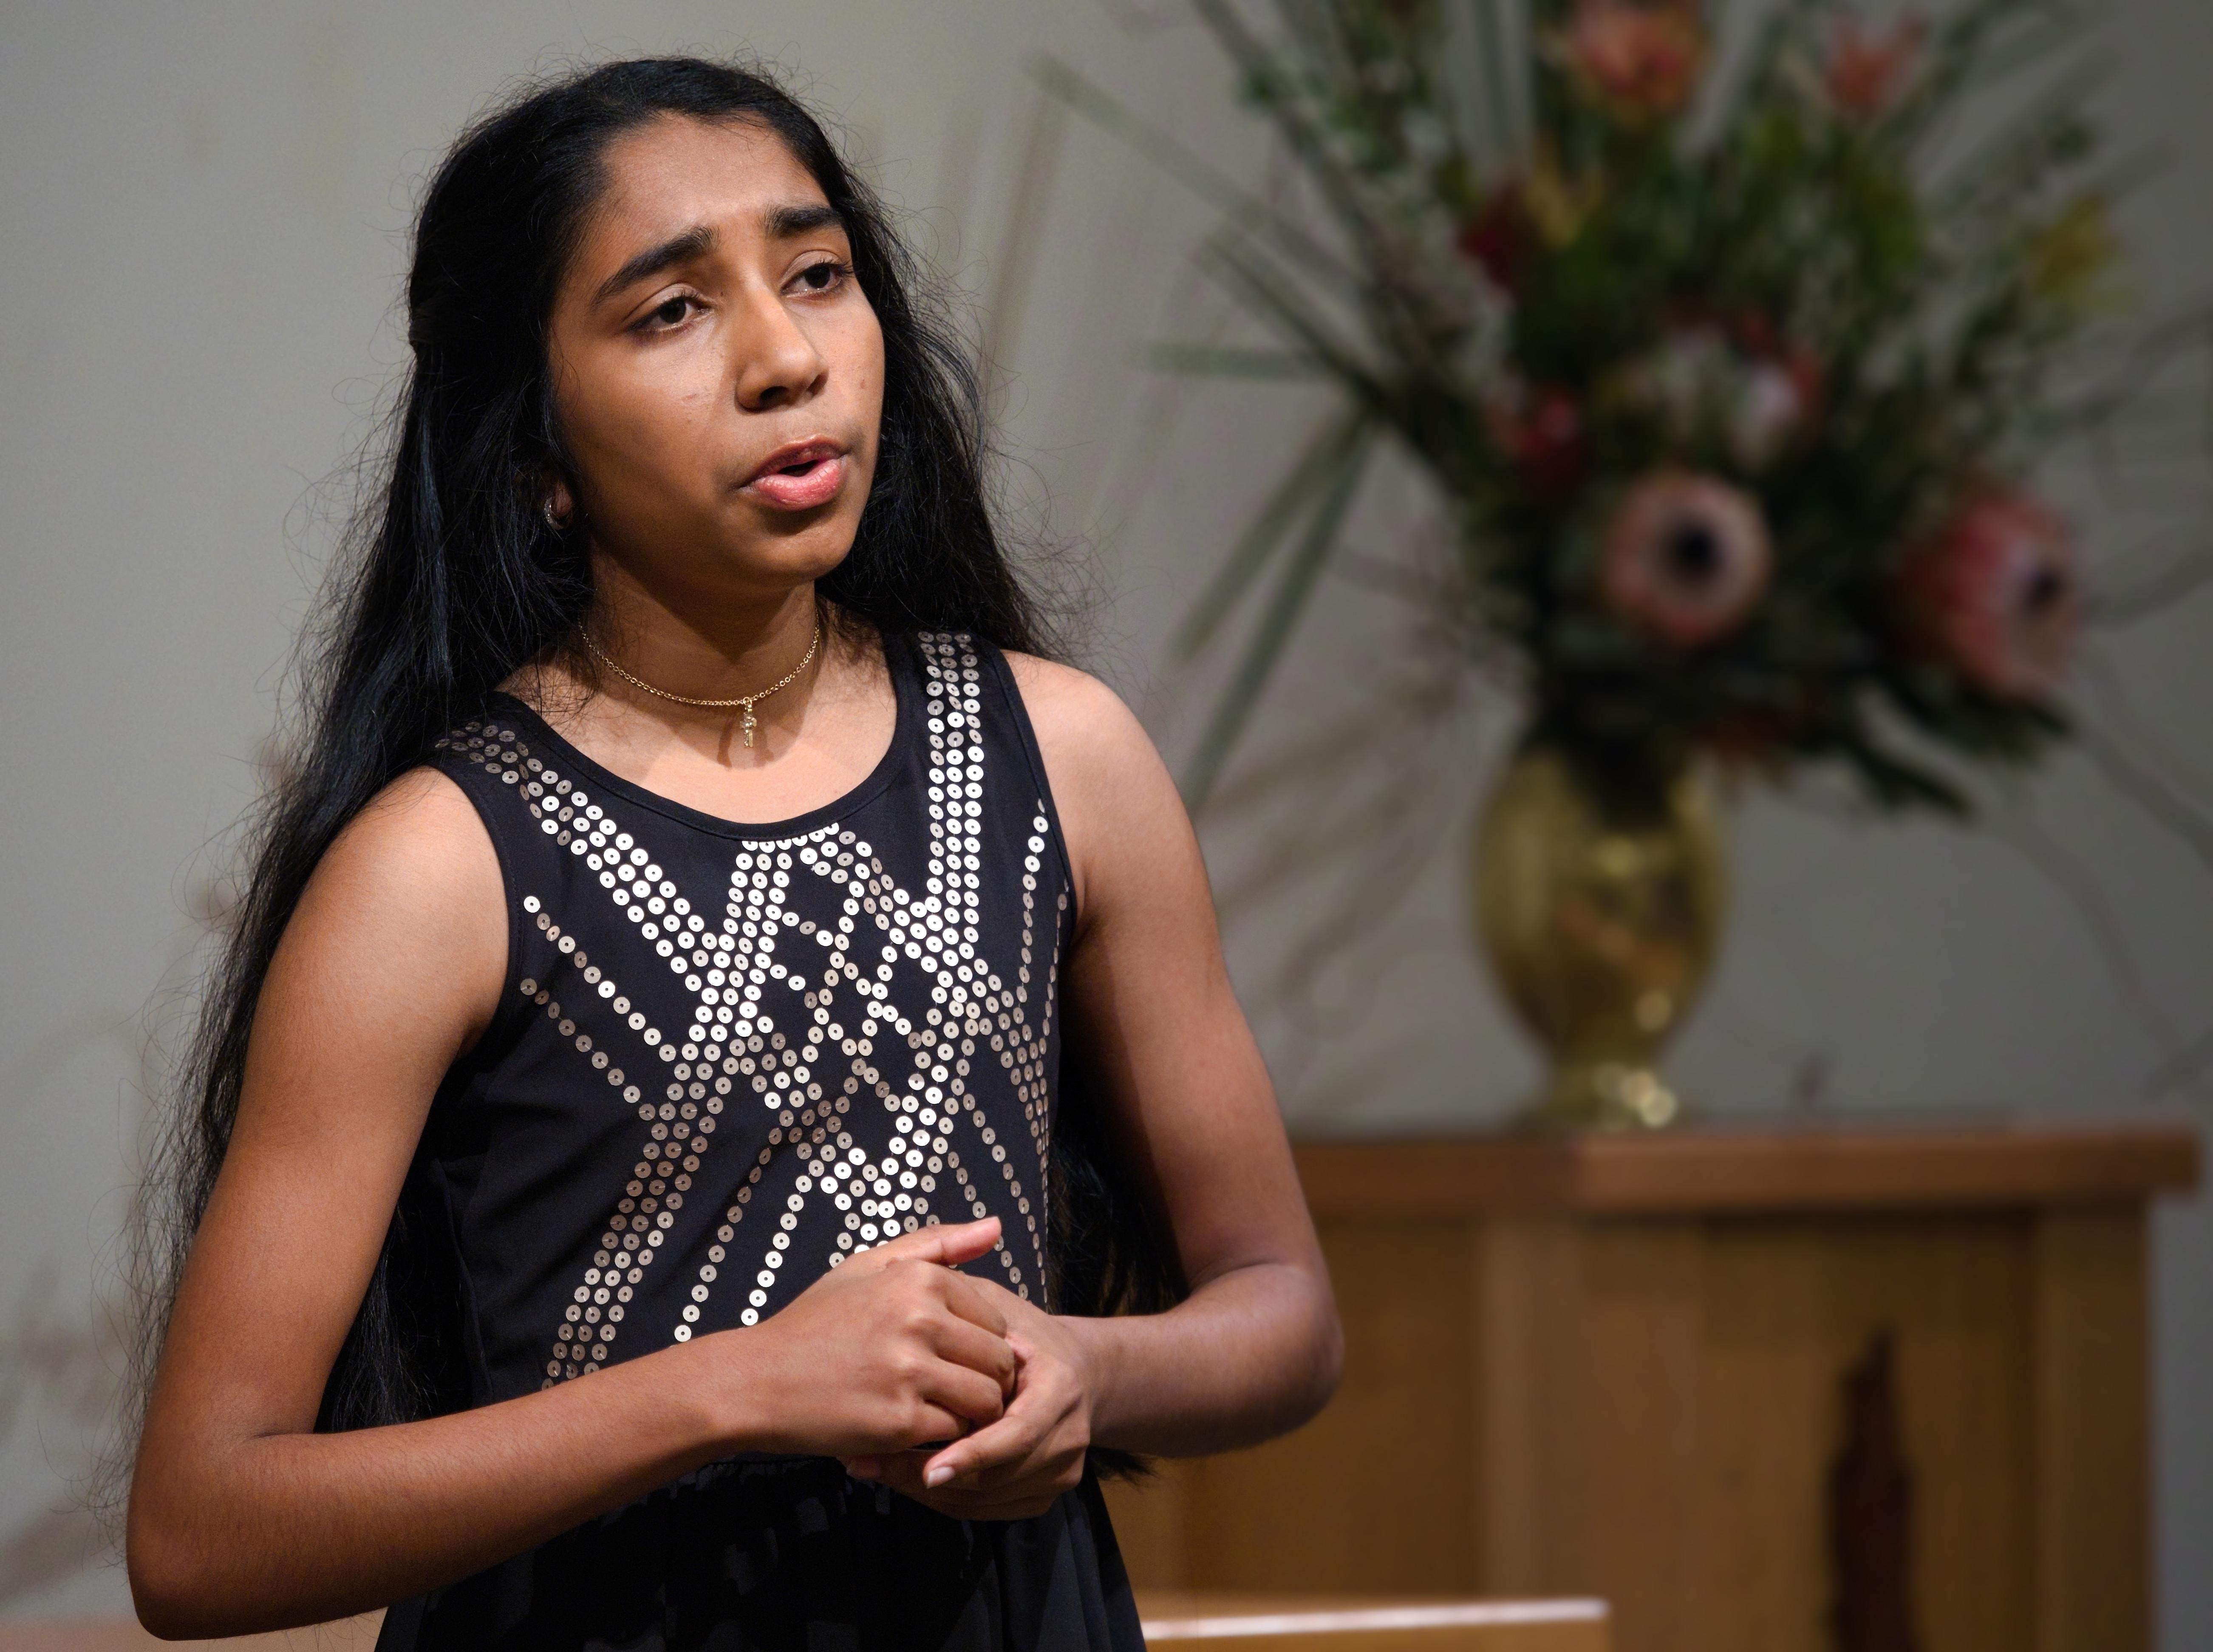 WGE Classical Vocal Annabelle Rajasingham Sings